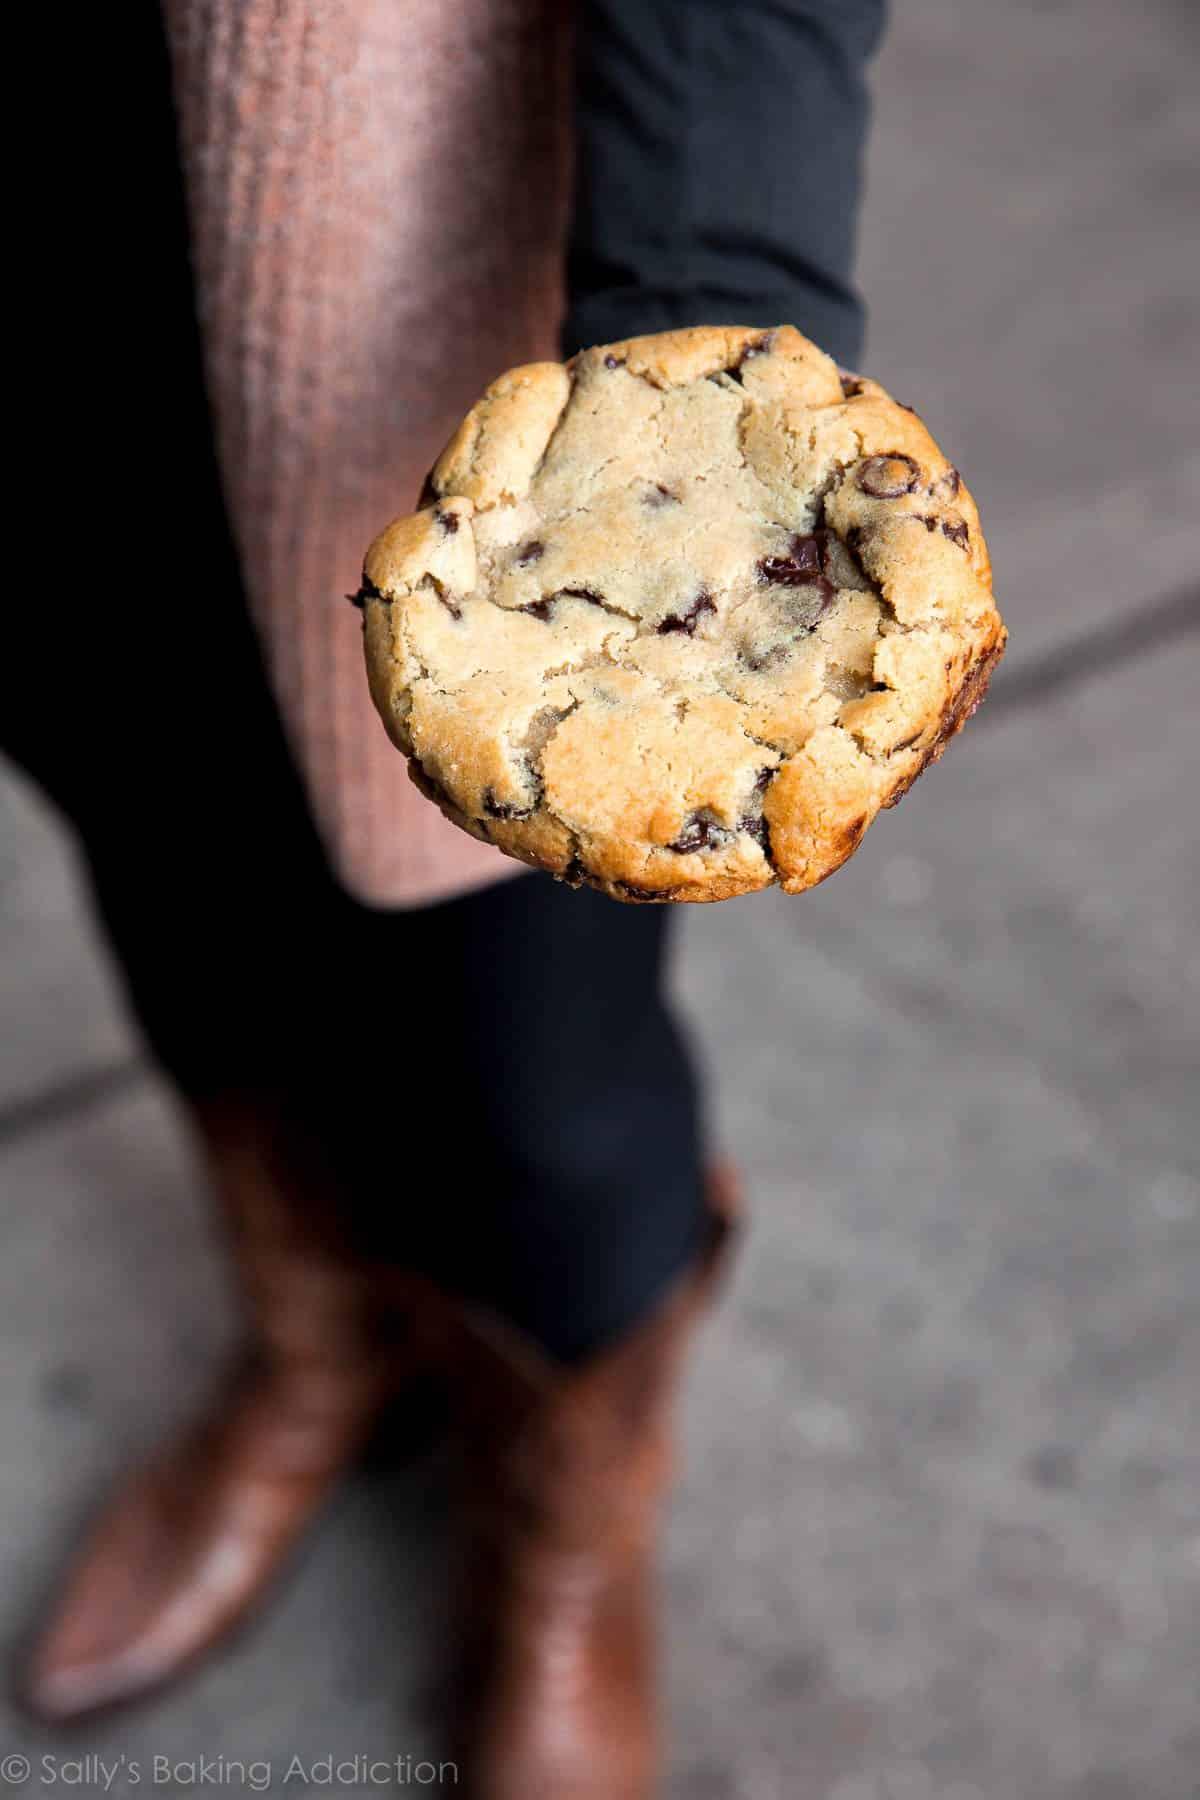 NYC Bakery Tour Part 1 - Sallys Baking Addiction